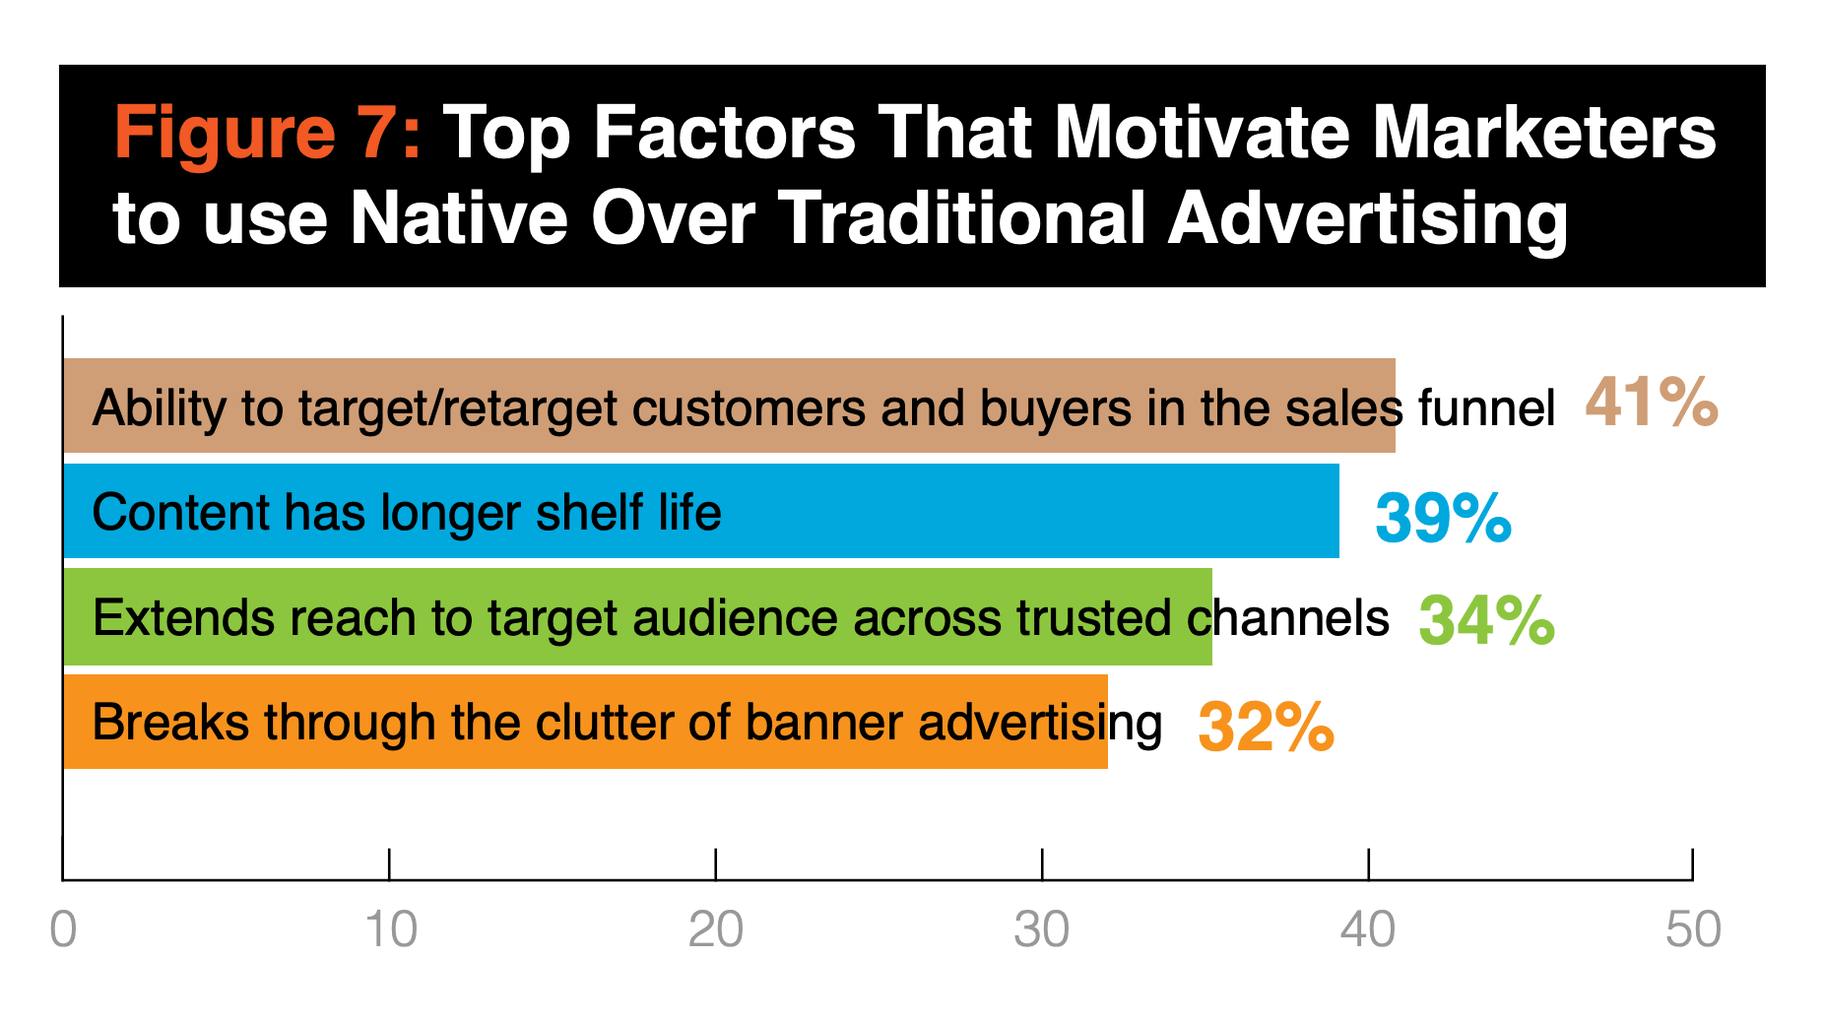 Native Advertising Motivators